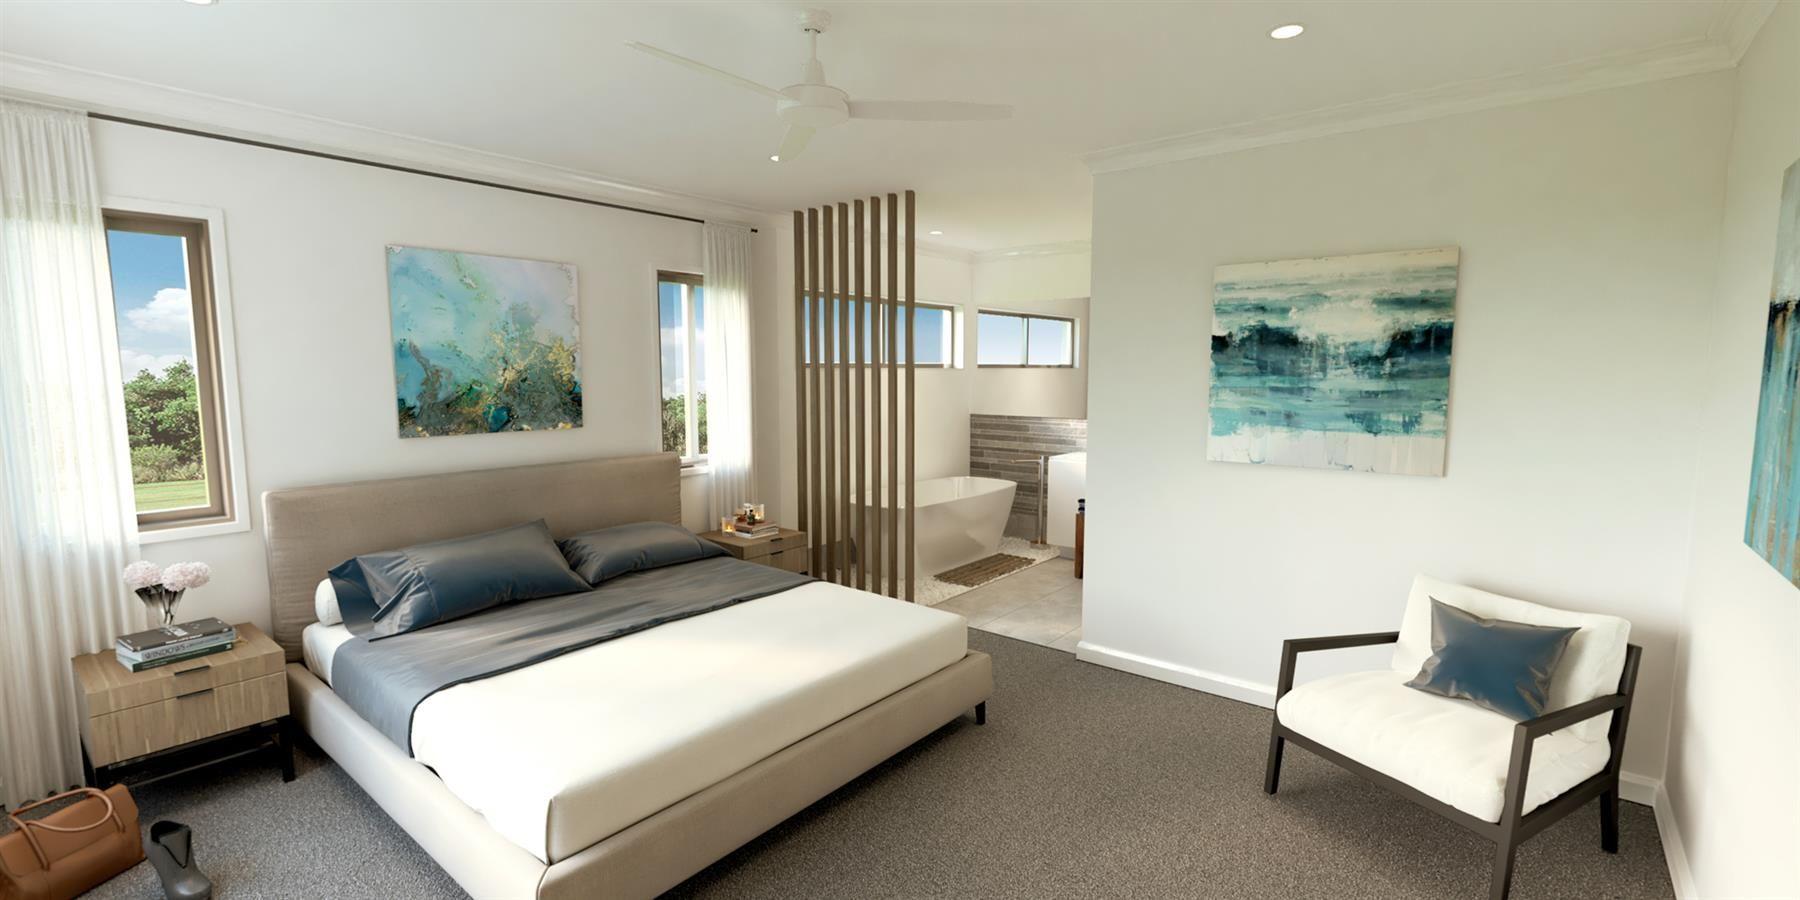 Lot 403 White Haven Crescent, Woolgoolga NSW 2456, Image 2